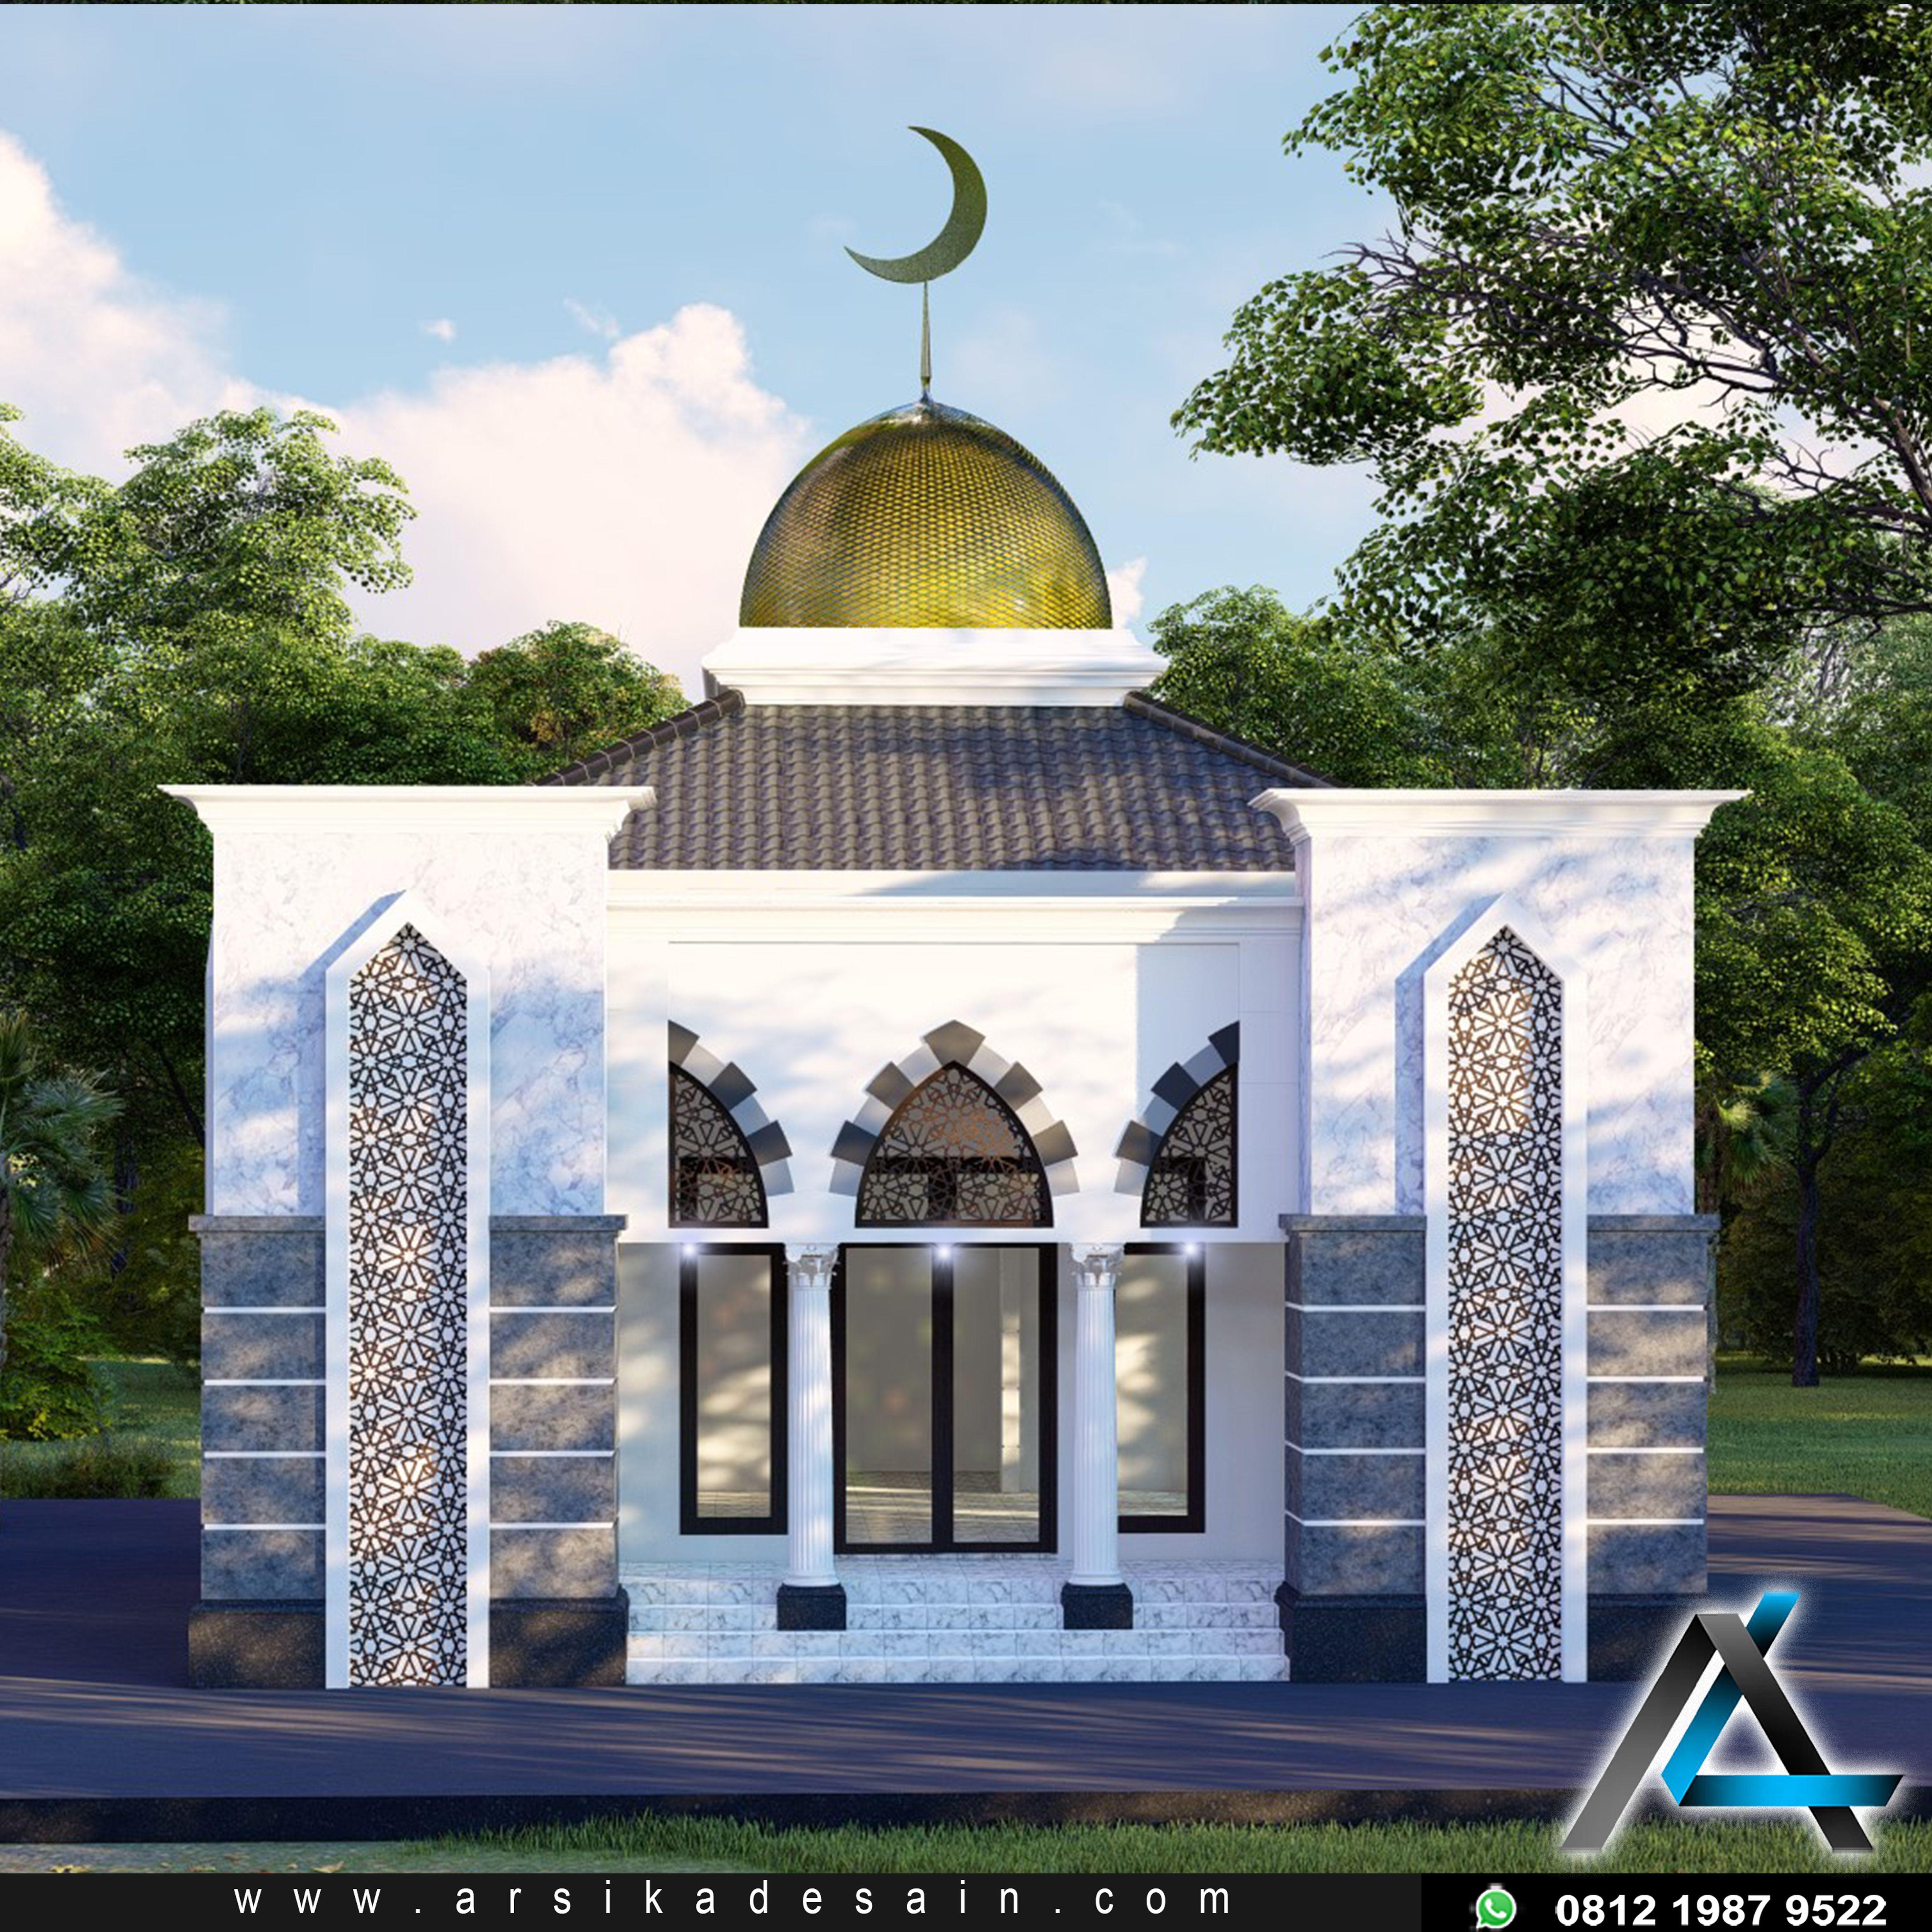 Desain Masjid Minimalis 2 Lantai Cek Bahan Bangunan Desain masjid kecil